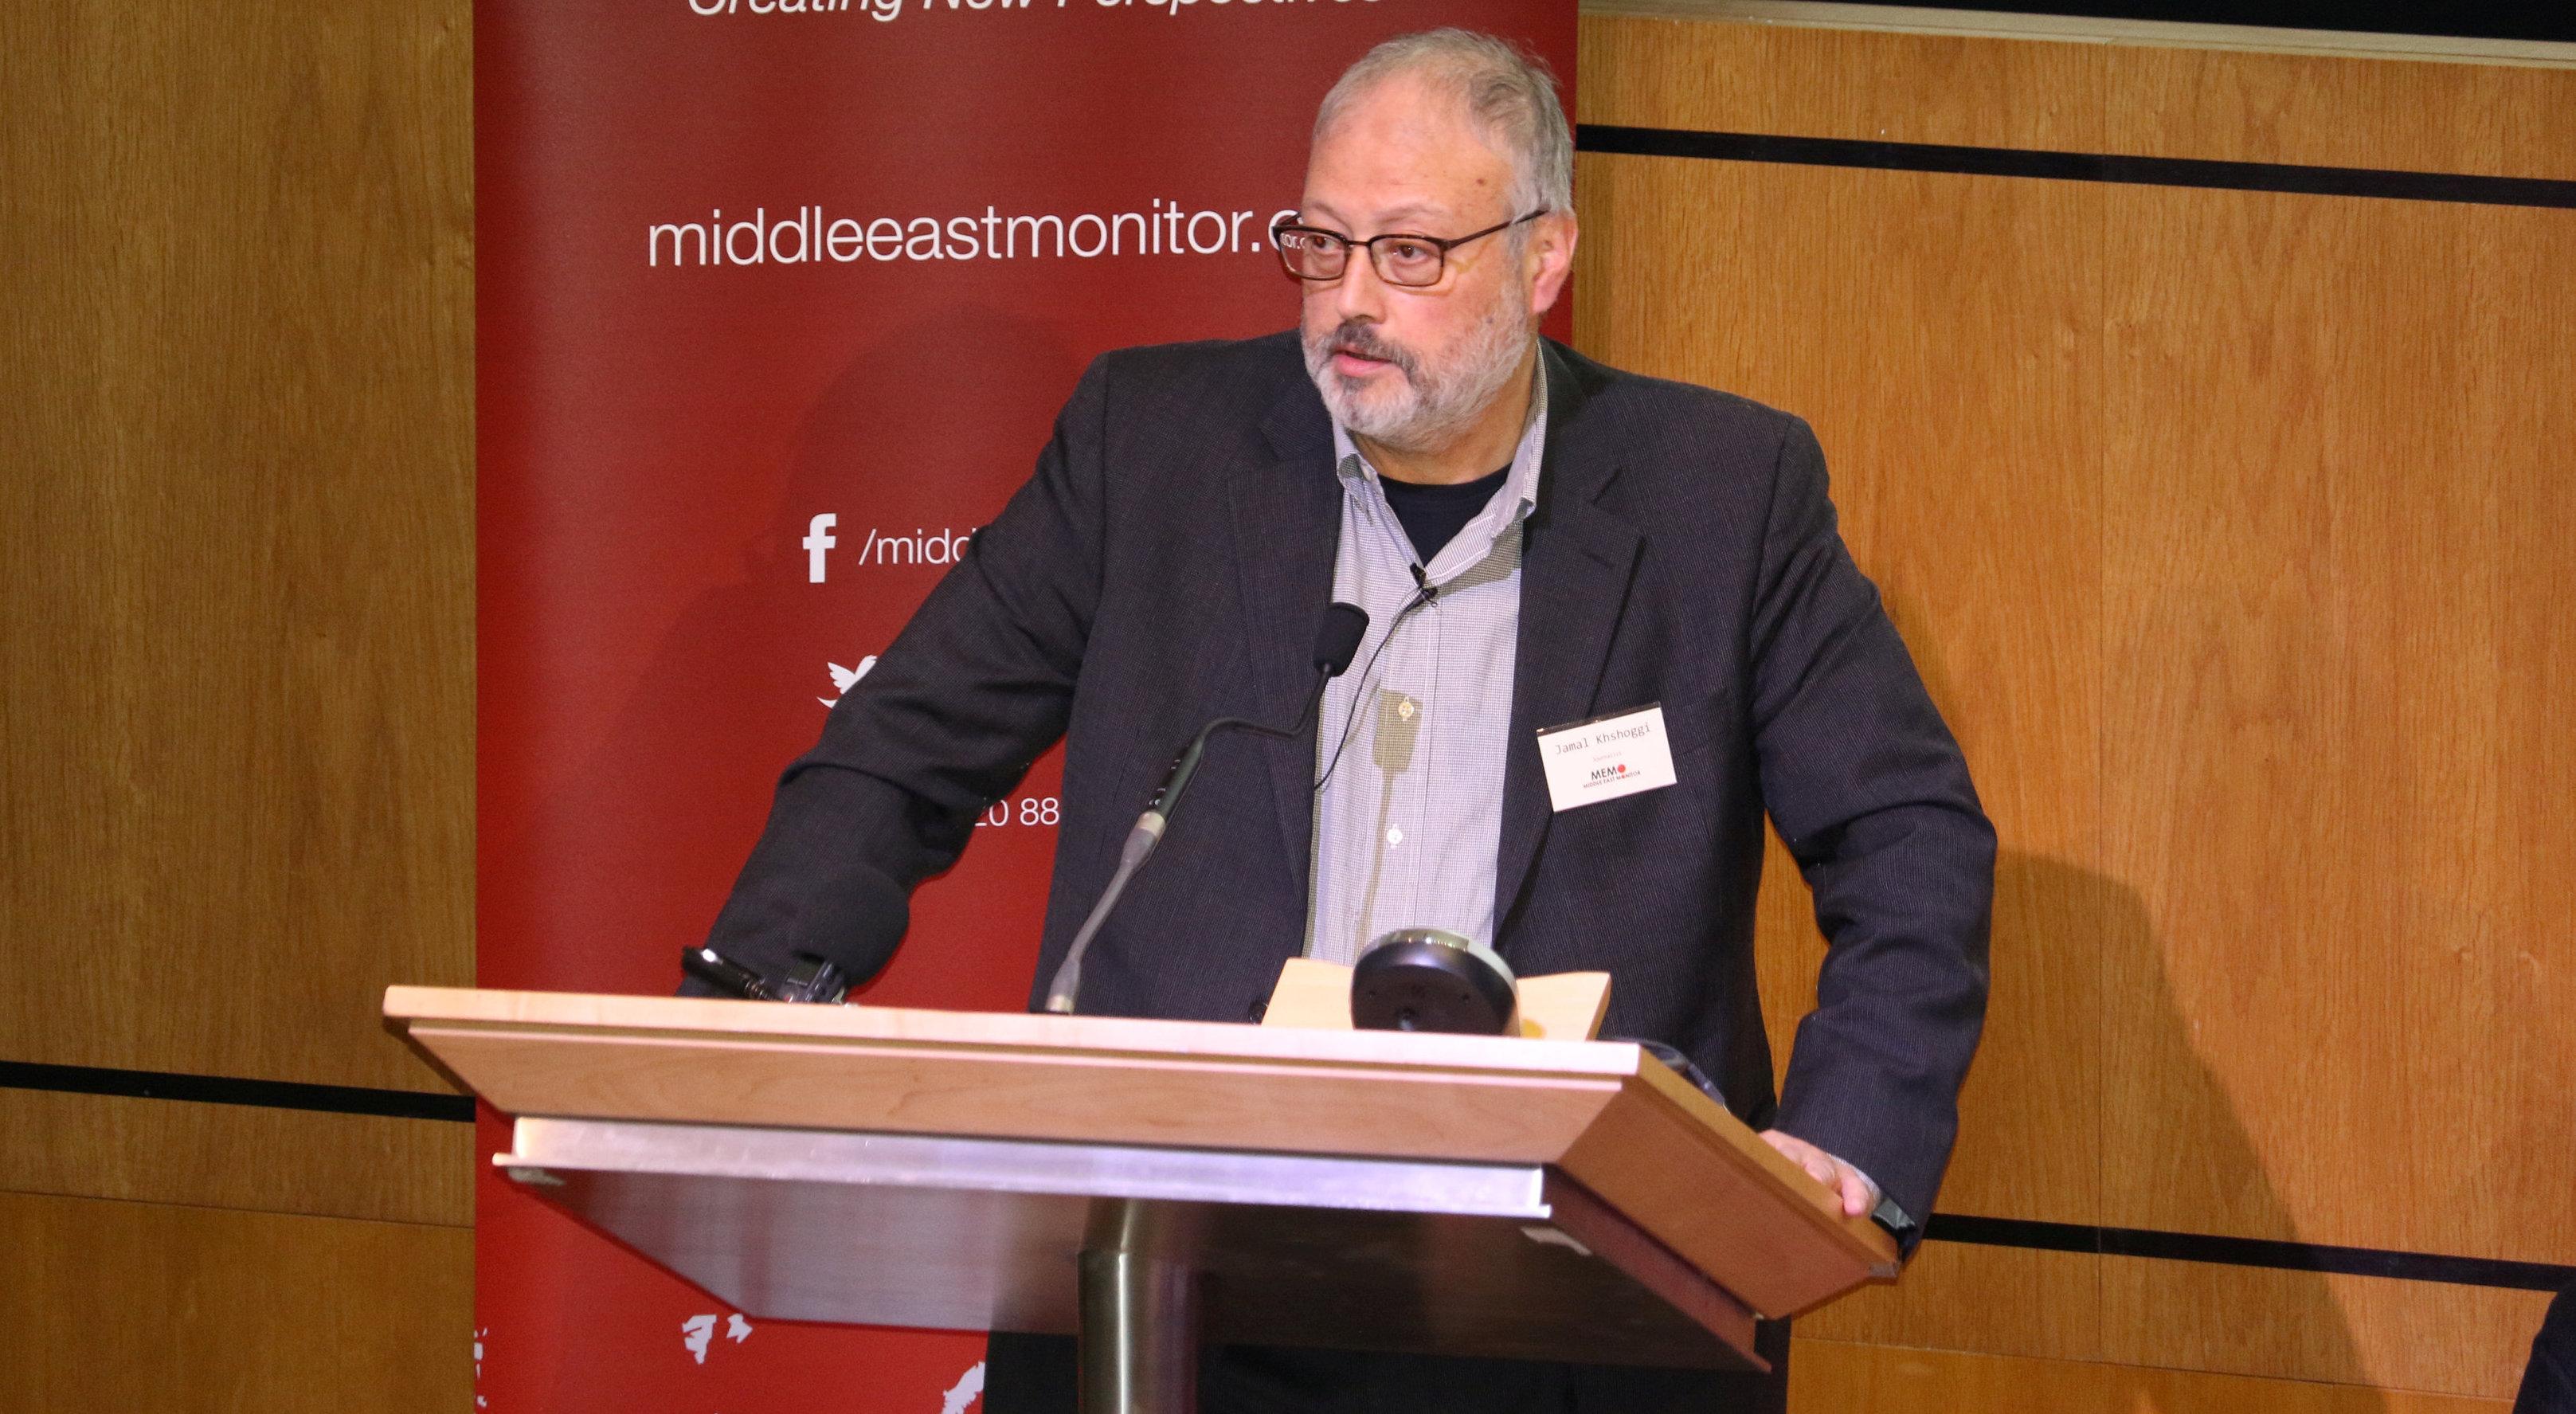 Jamal Khashoggi, periodista saudí desaparecido el 2 de octubre